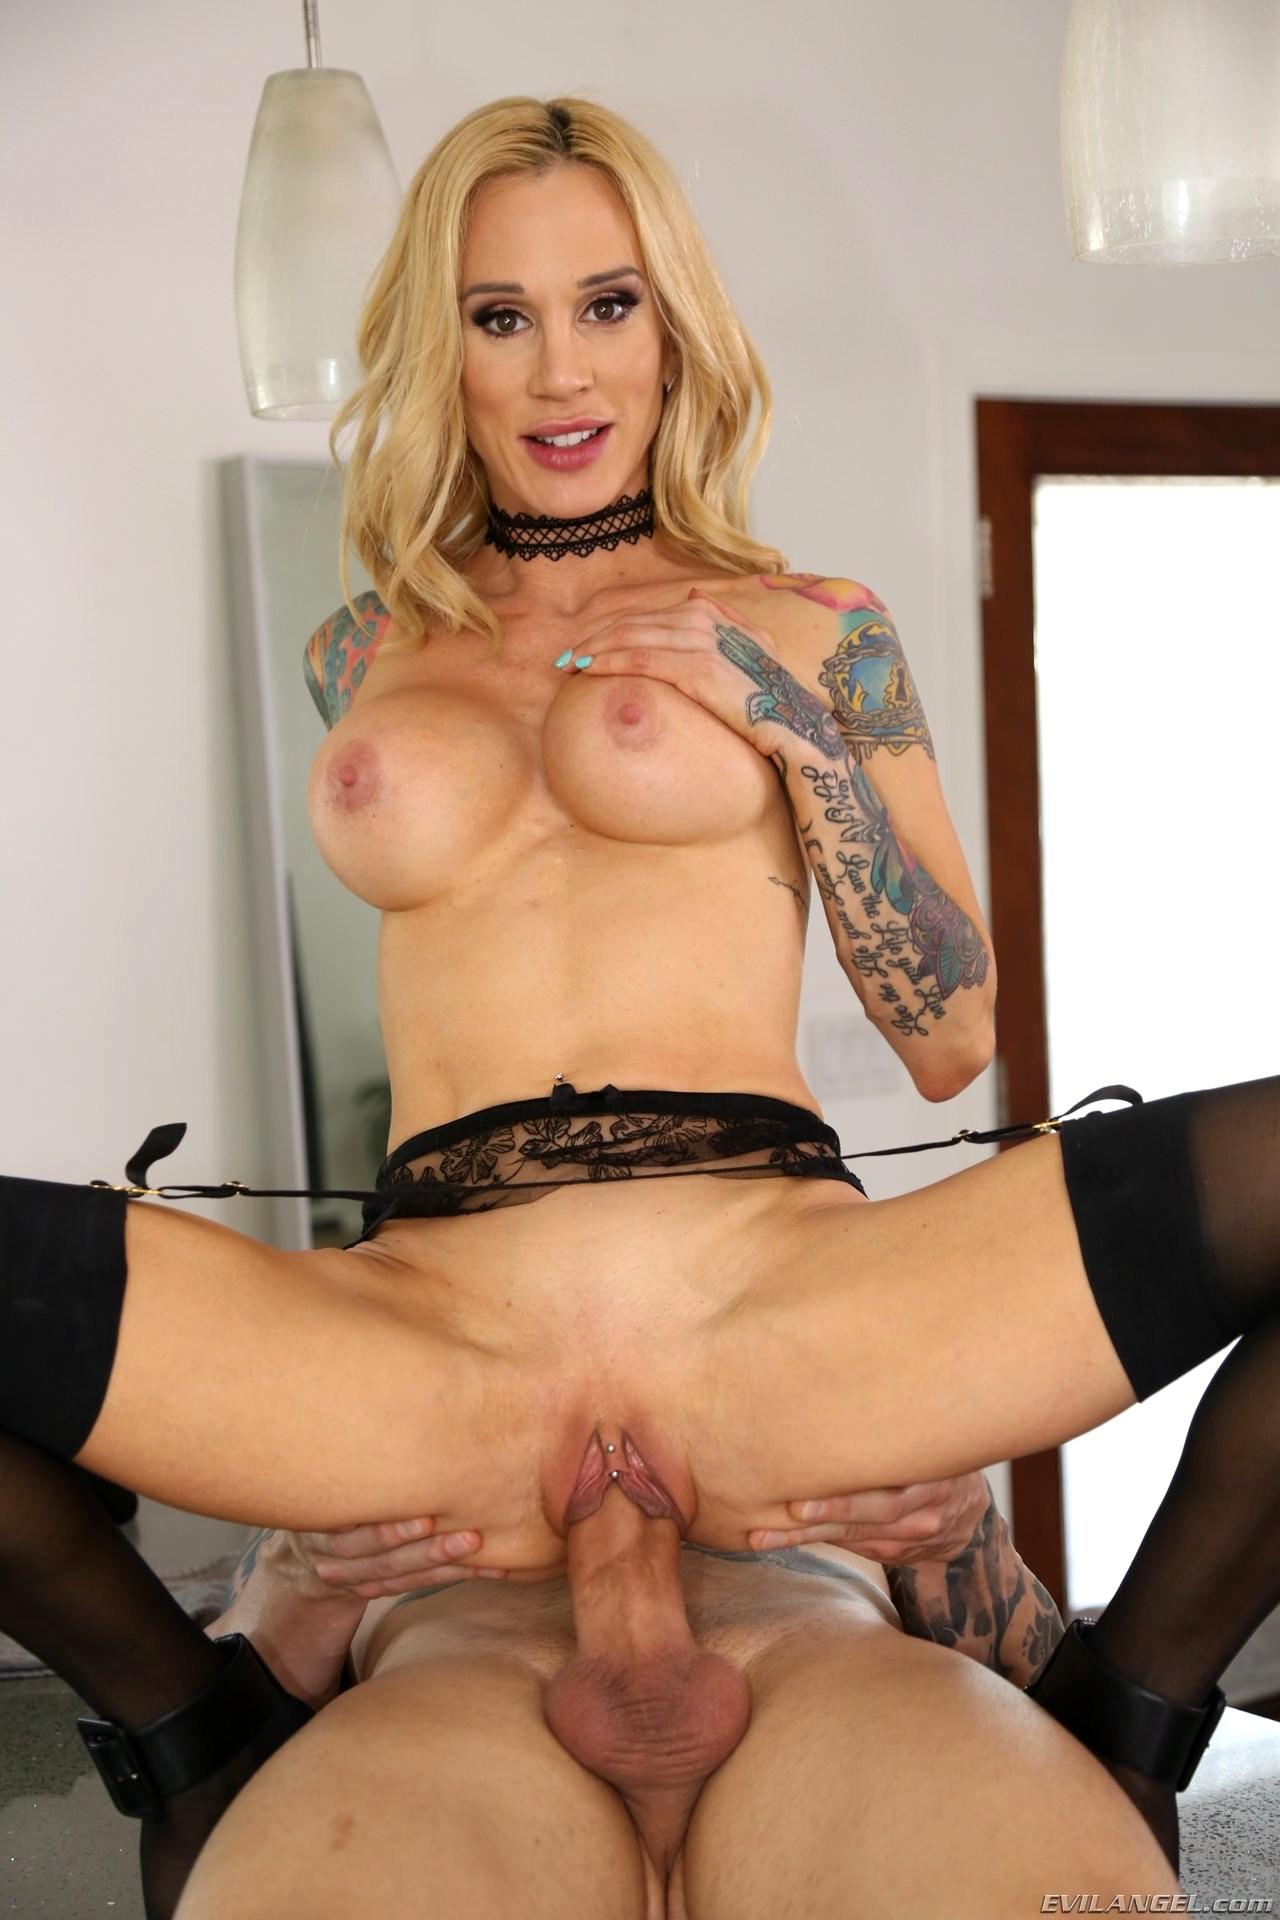 evilangel sarah jessie moviespix milf mature doctor sex free